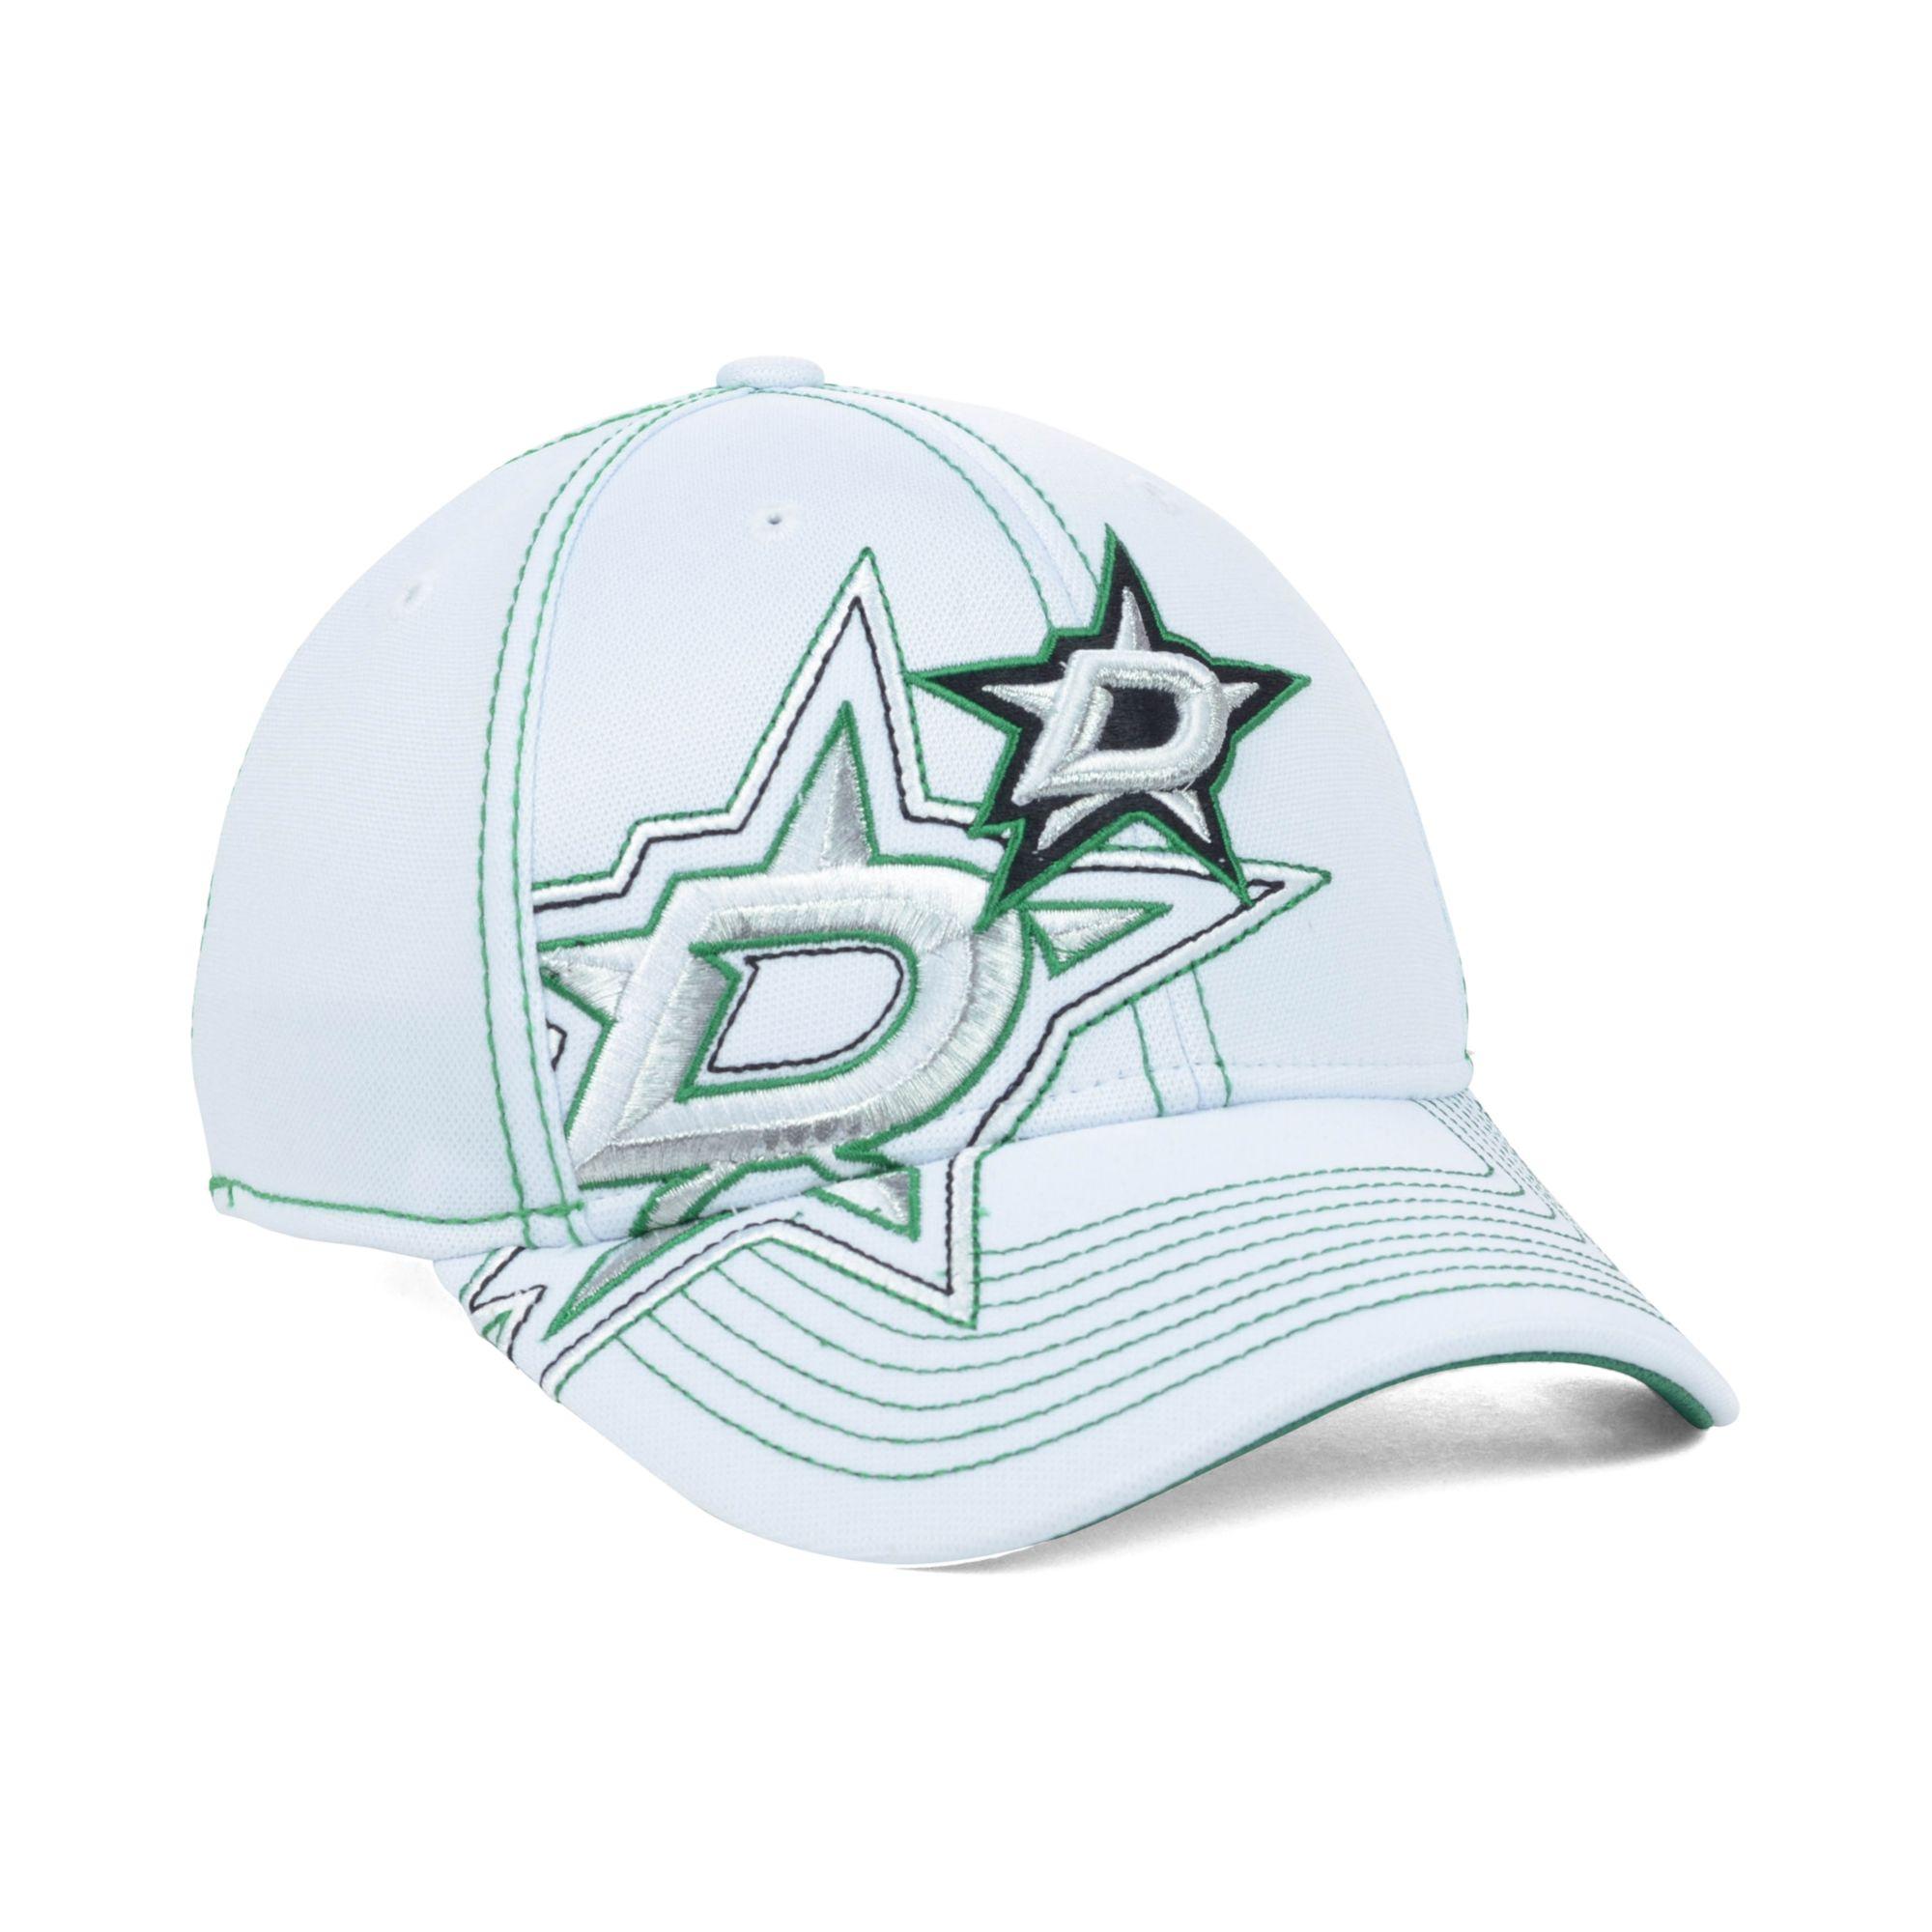 the latest 84987 1e724 ... top quality lyst reebok dallas stars nhl 2nd season draft cap in white  for men f6543